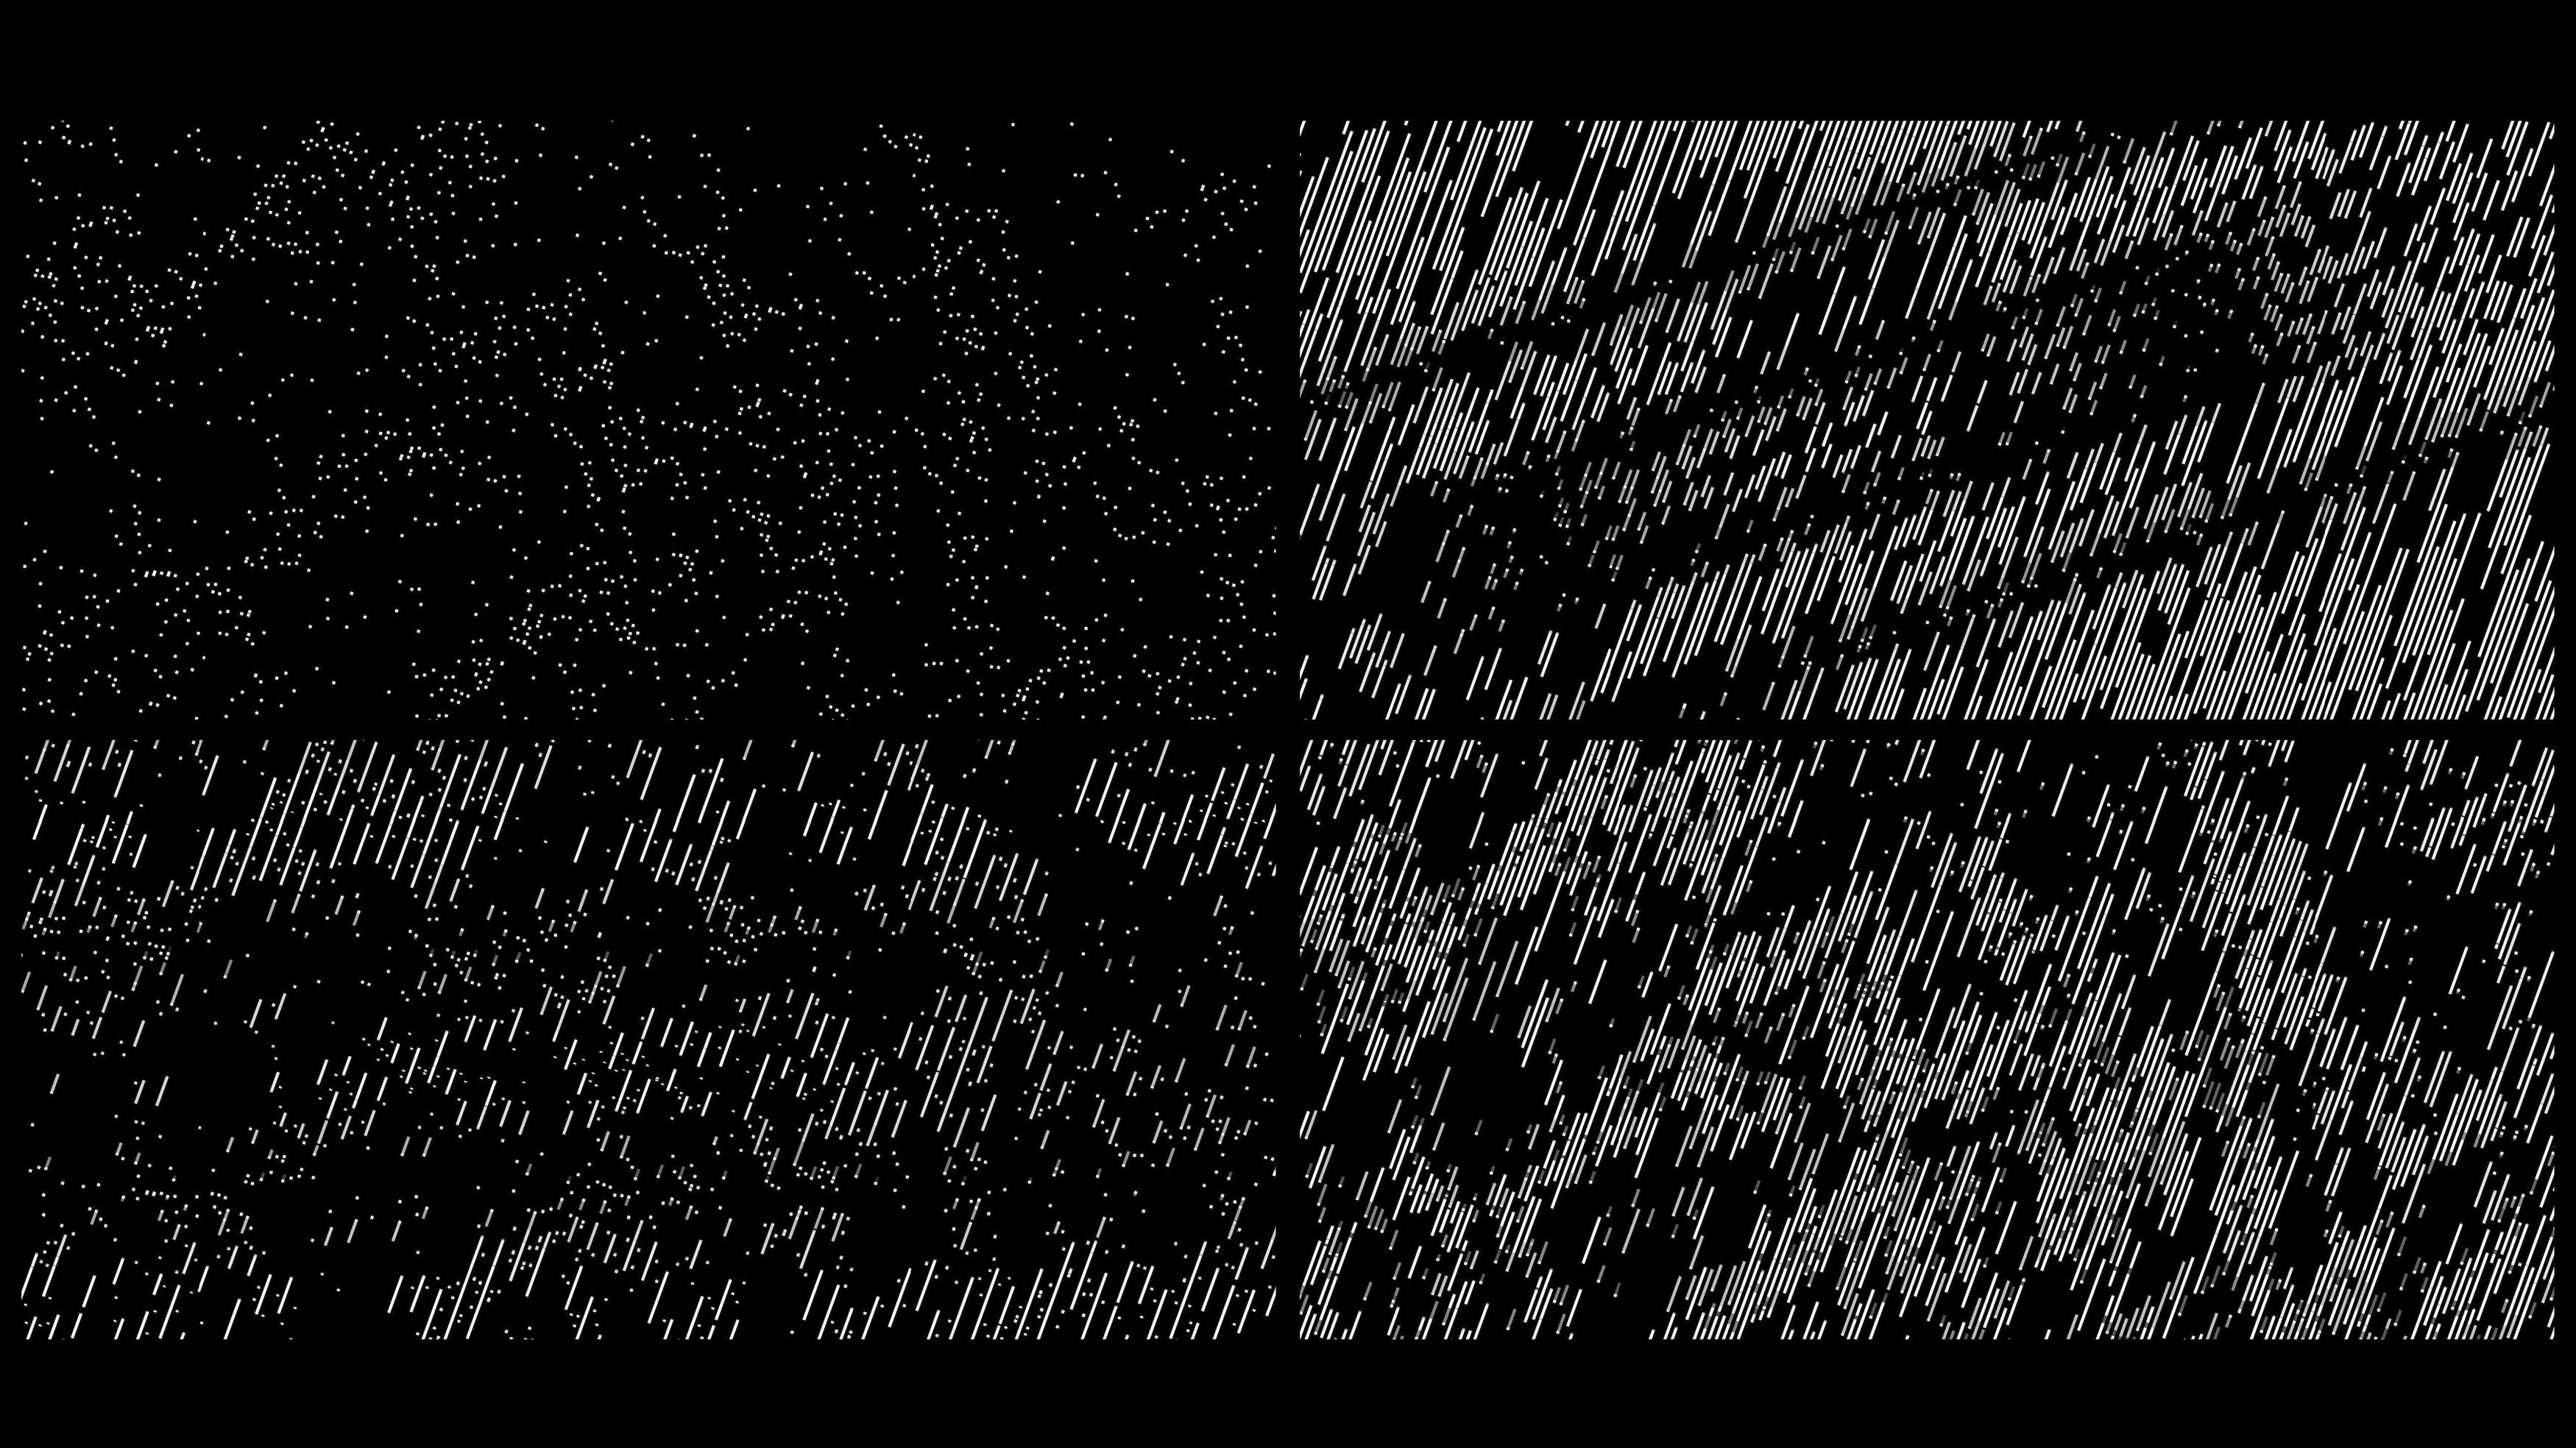 Idemia Behind the Curtain - fehmican com